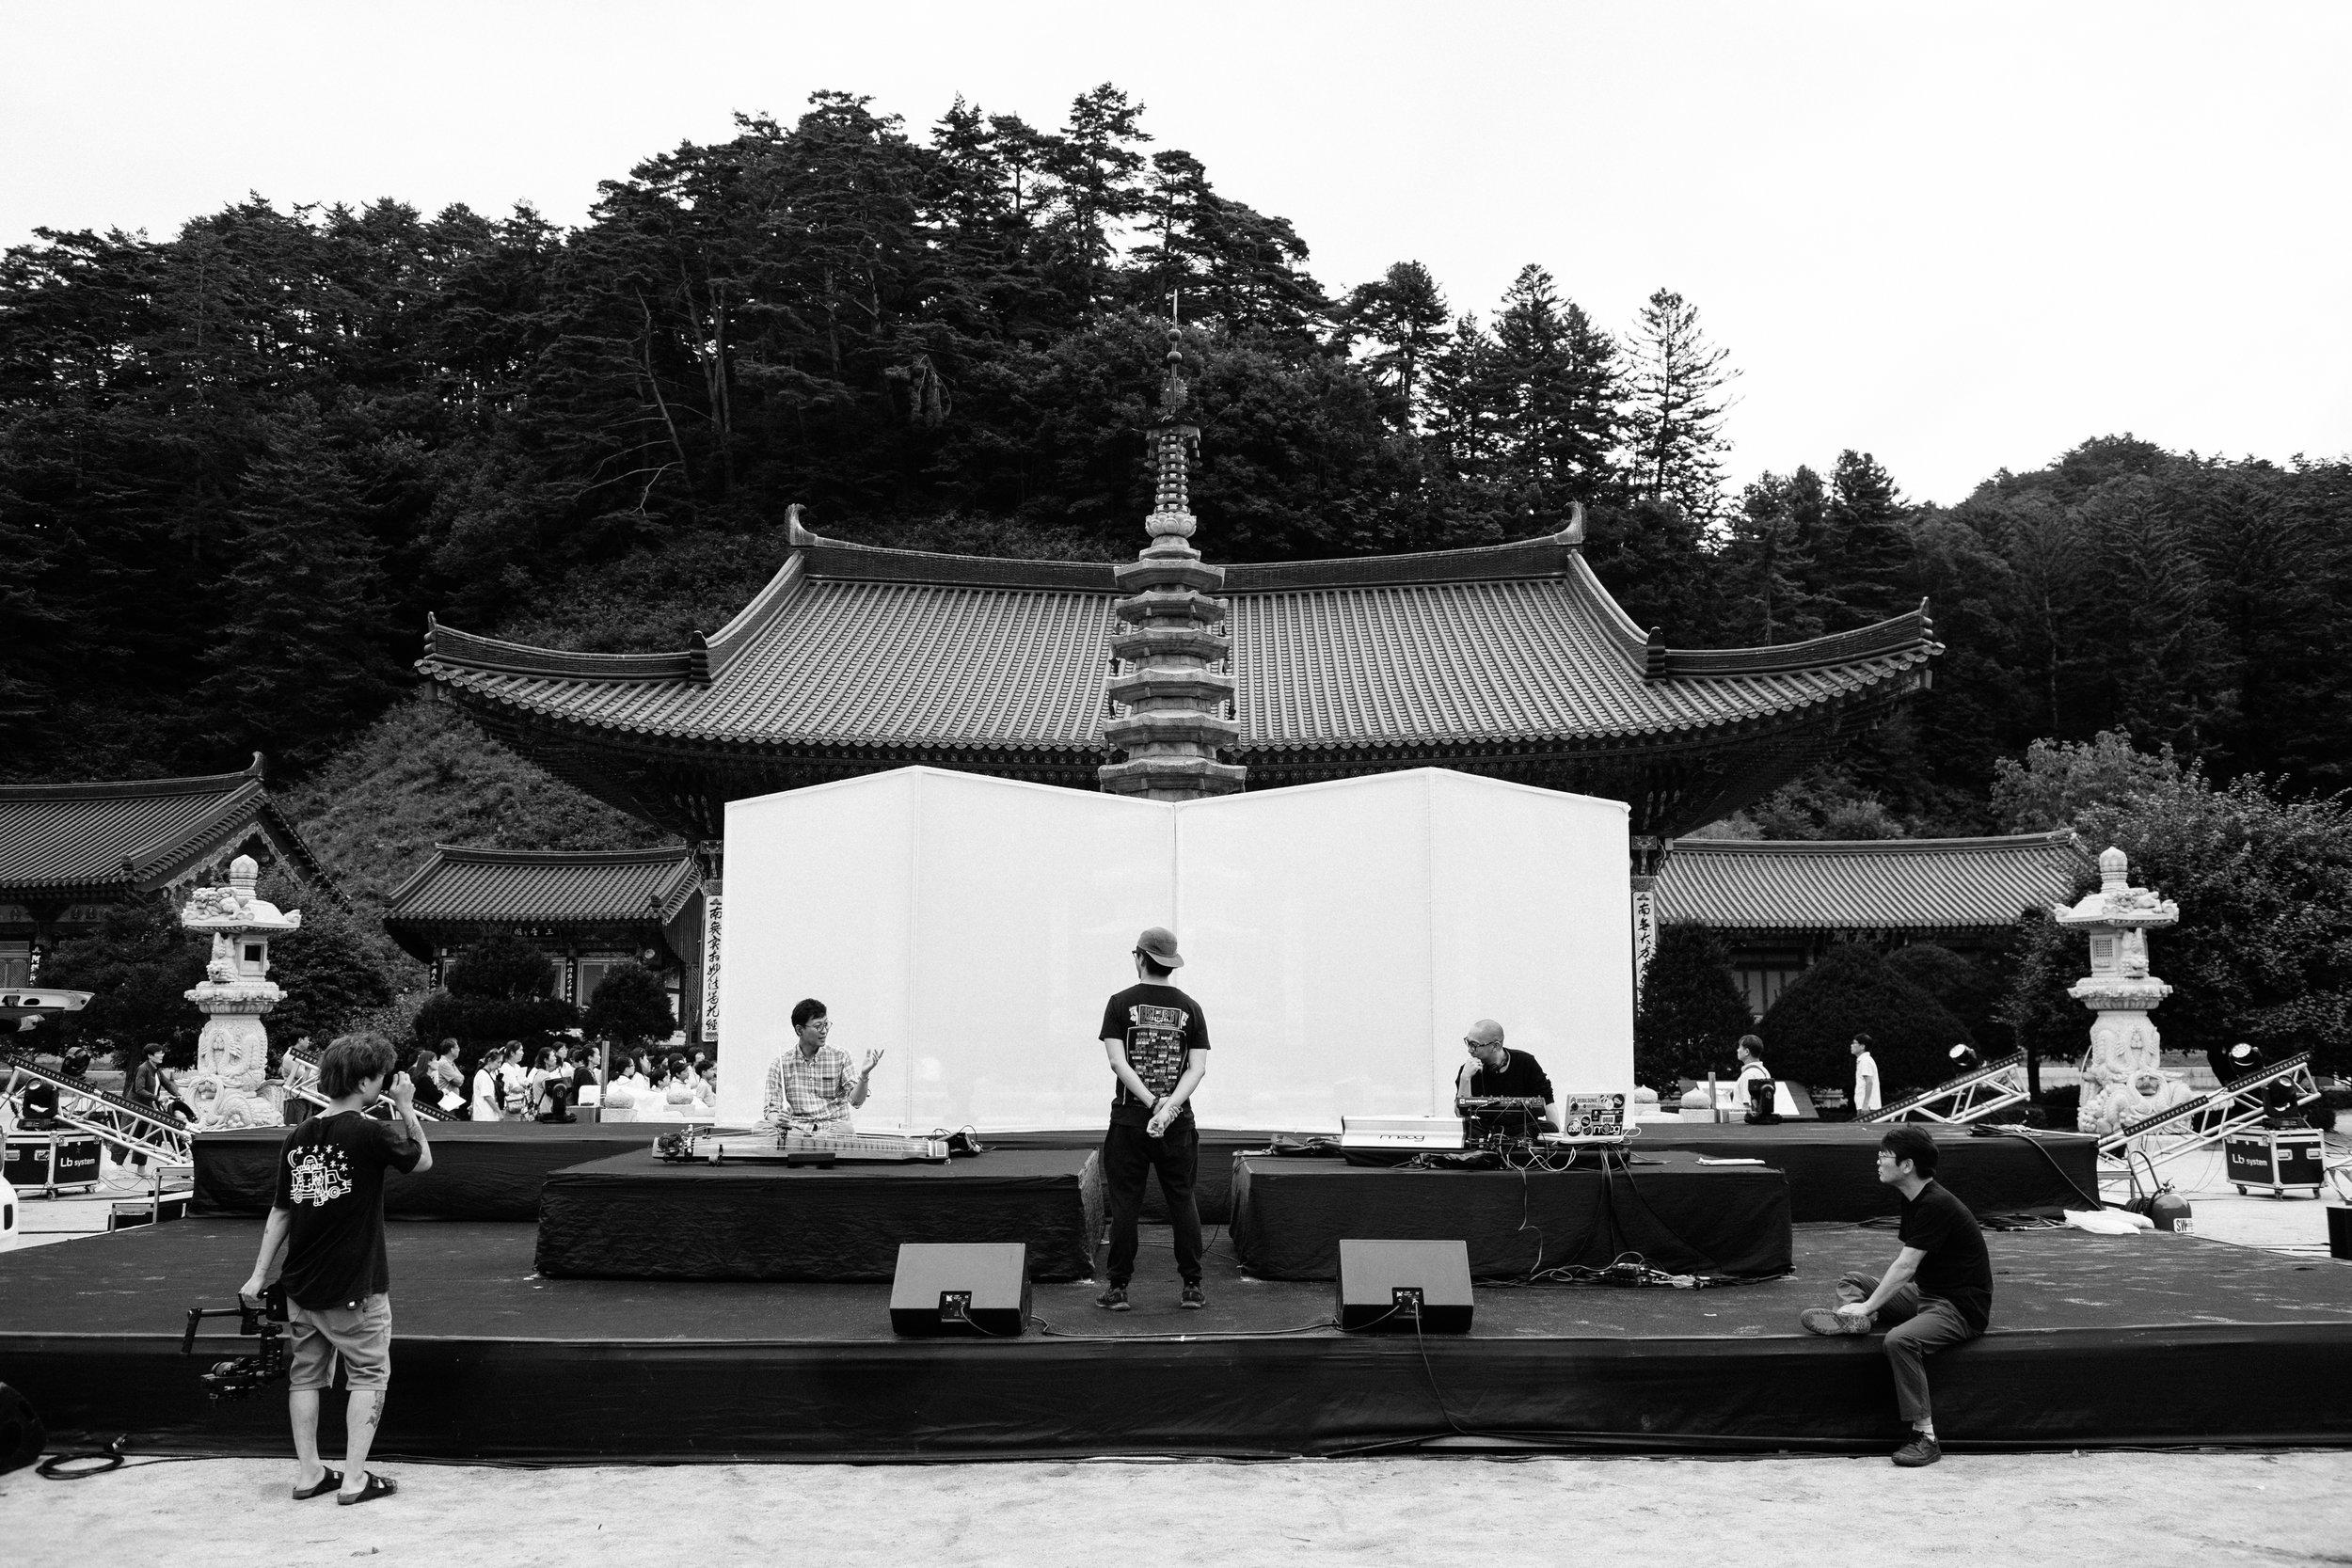 2017_muto_woljeongsa_rehearsal_32.JPG